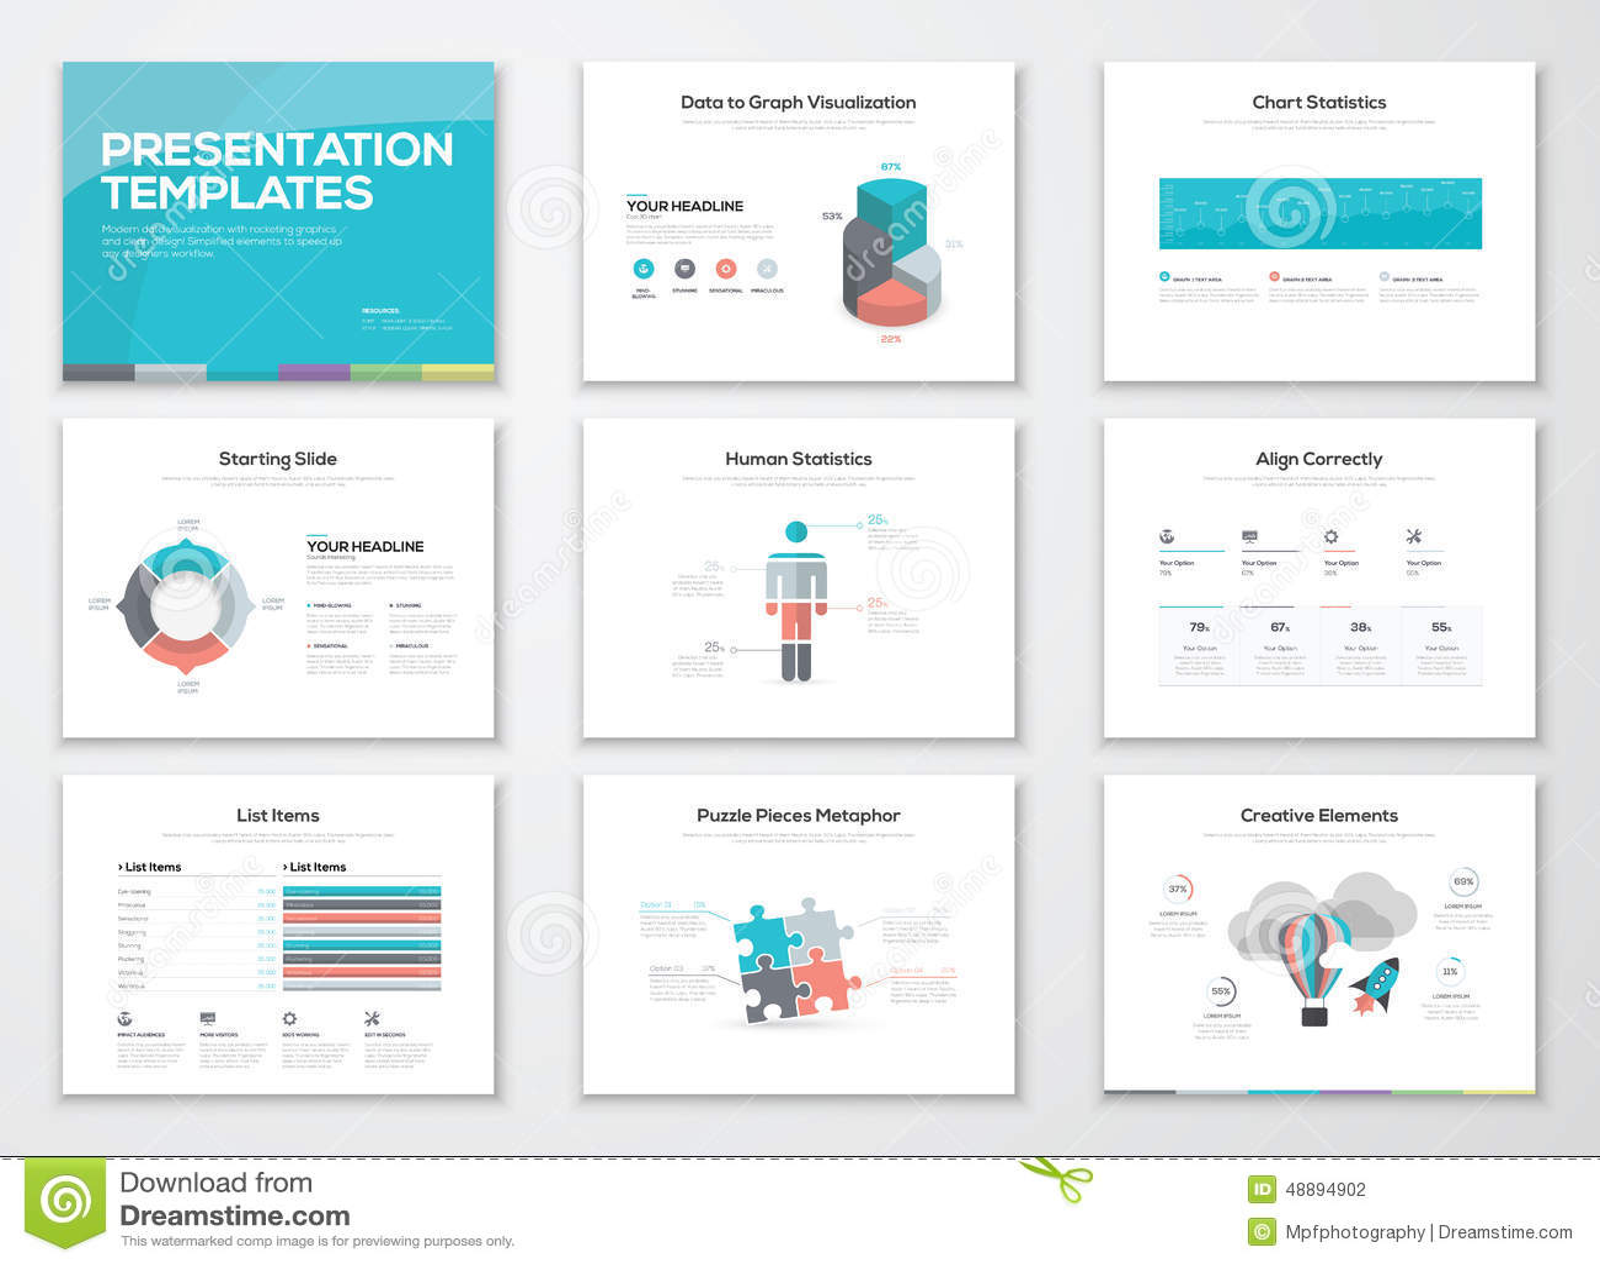 infographics presentation templates and business media brochures stock vector image 48894902. Black Bedroom Furniture Sets. Home Design Ideas